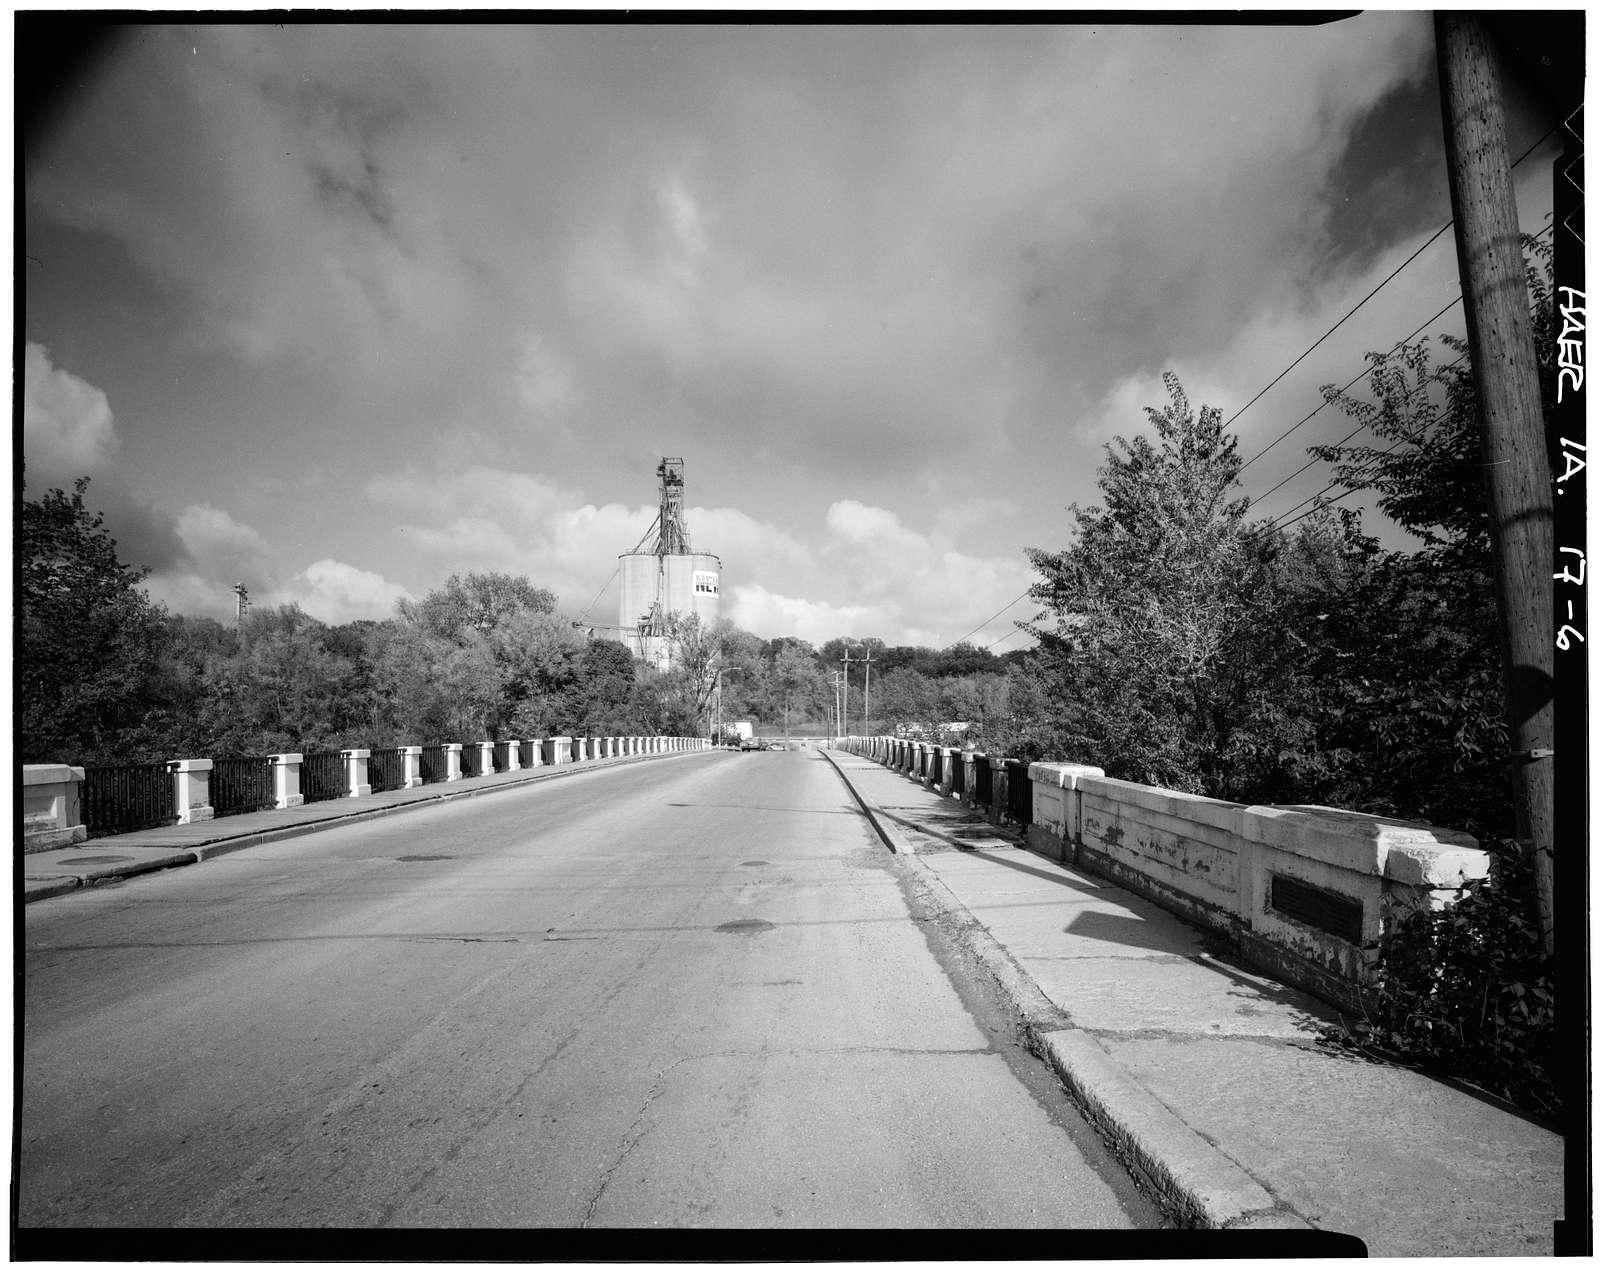 Open Spandrel Bridge, Hawkeye Avenue, spanning Des Moines River, Fort Dodge, Webster County, IA